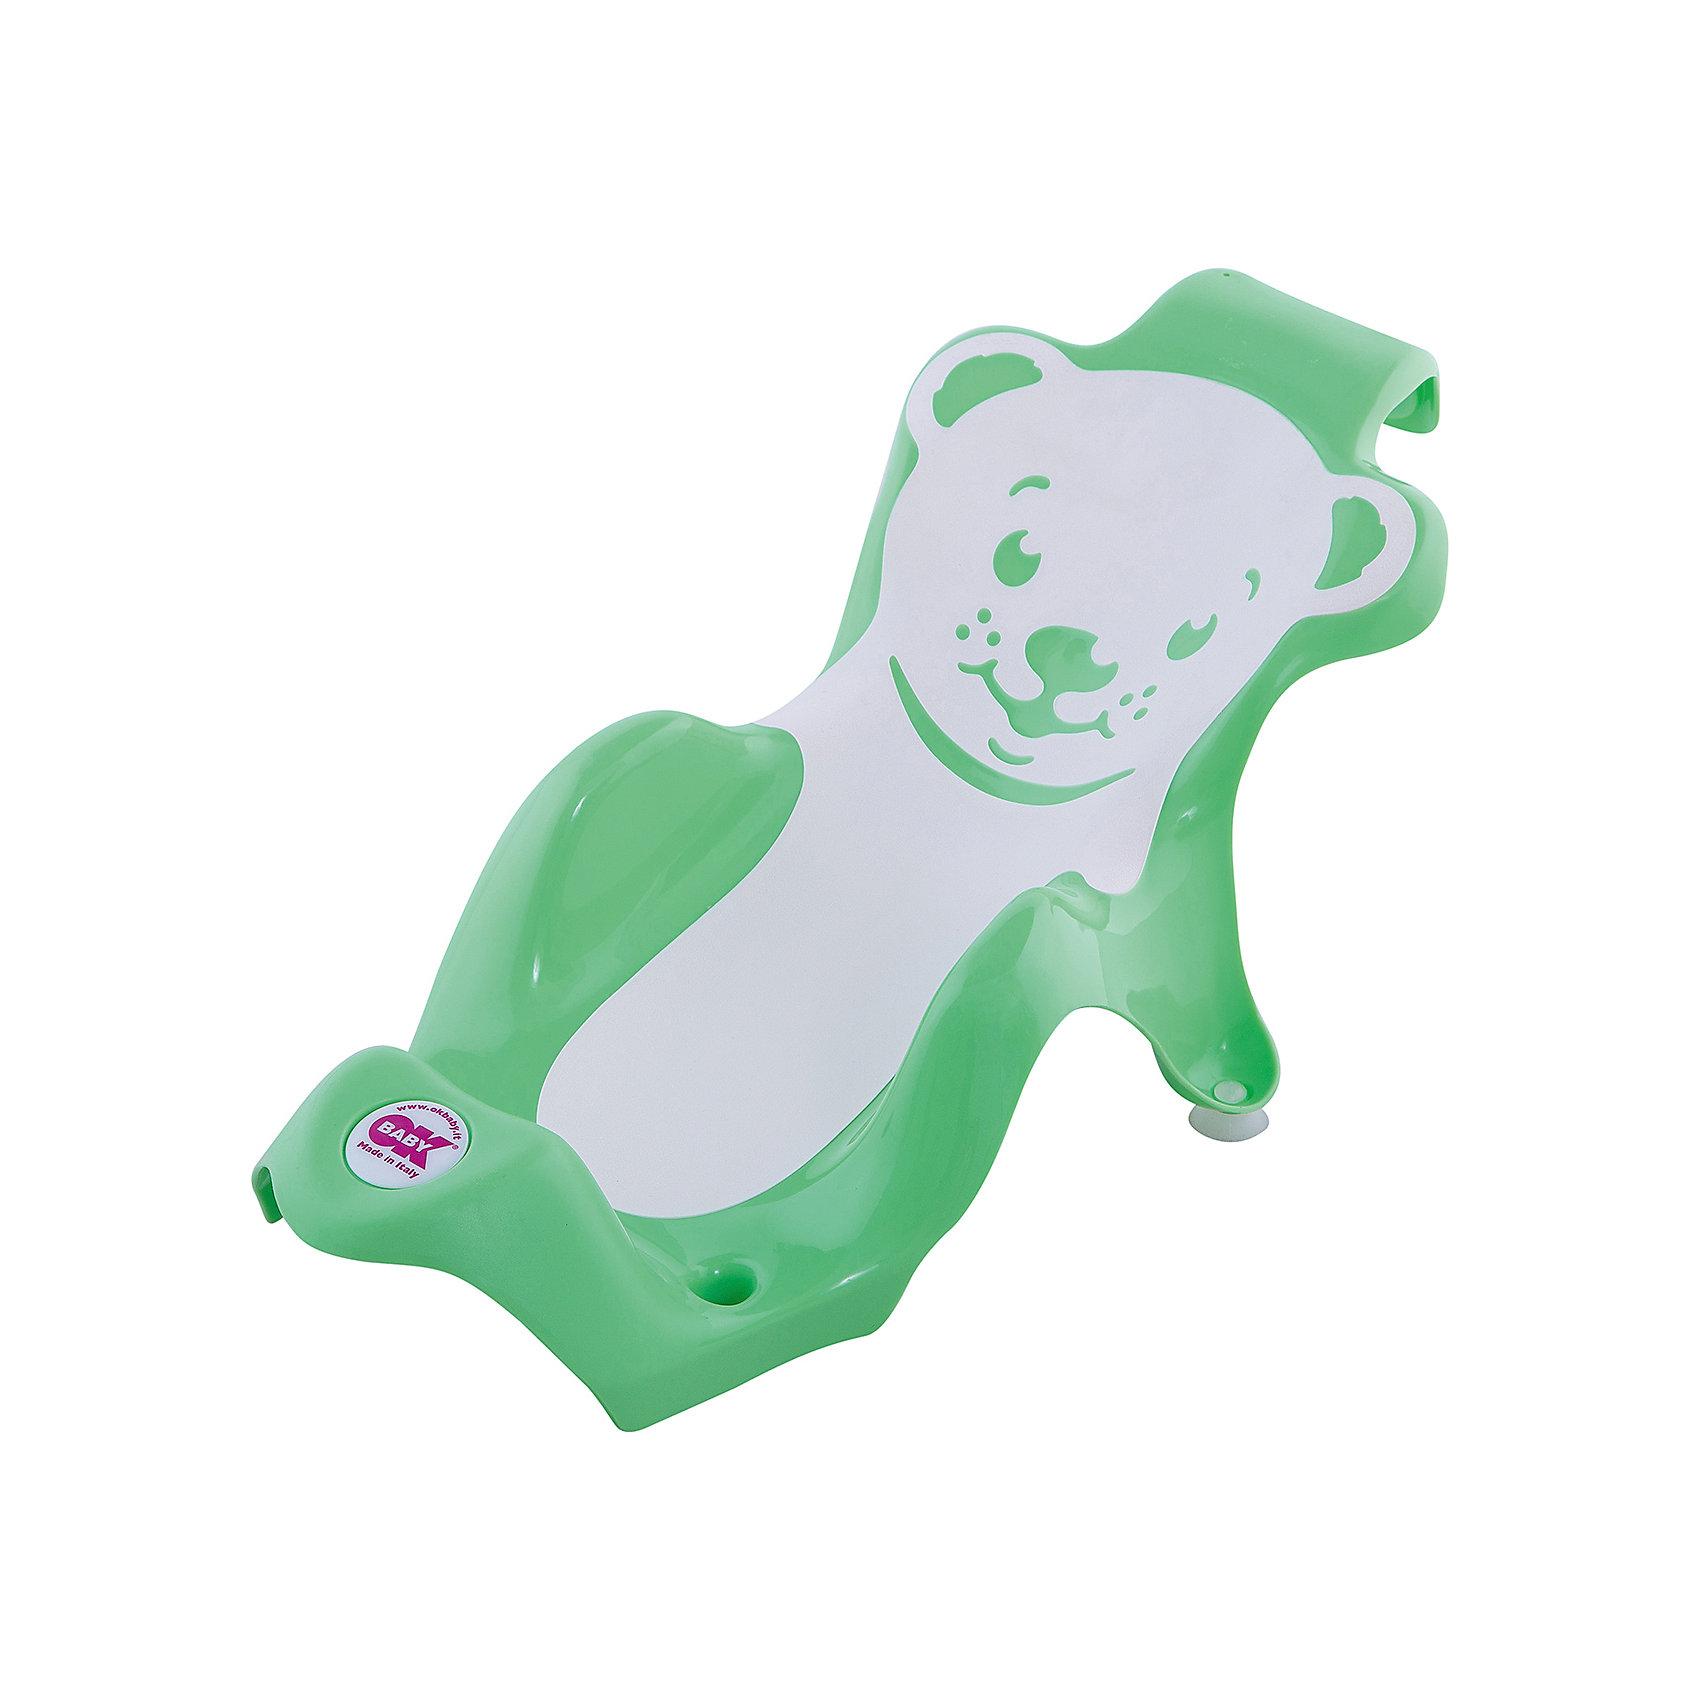 OK Baby Горка для купания Buddy, Ok Baby, зеленый